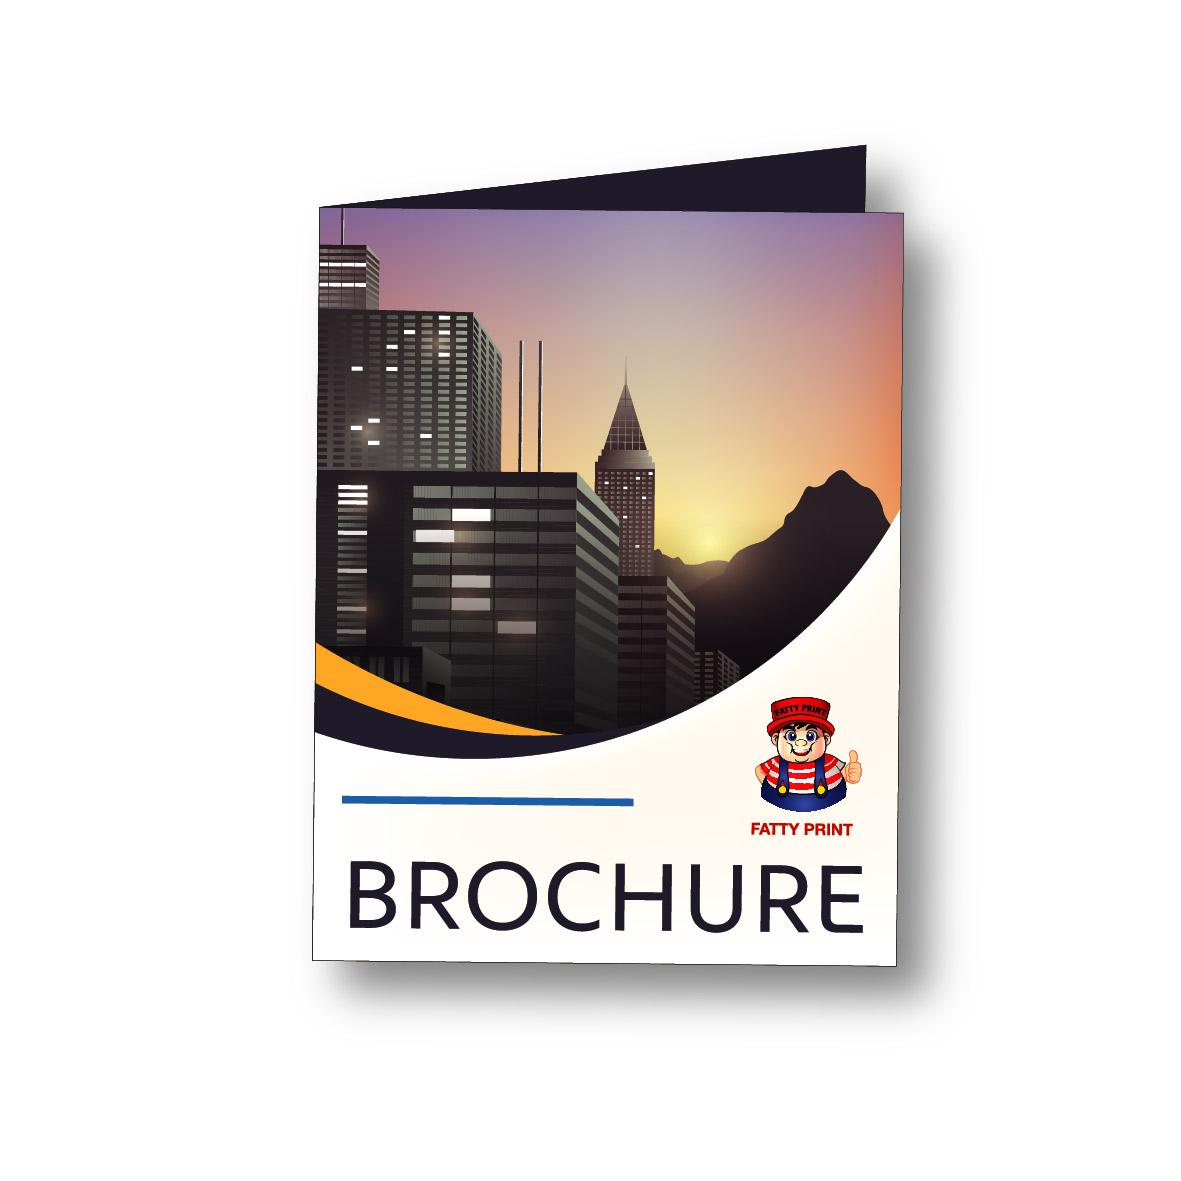 Brochure A4 Fold to A5 128gsm Artpaper